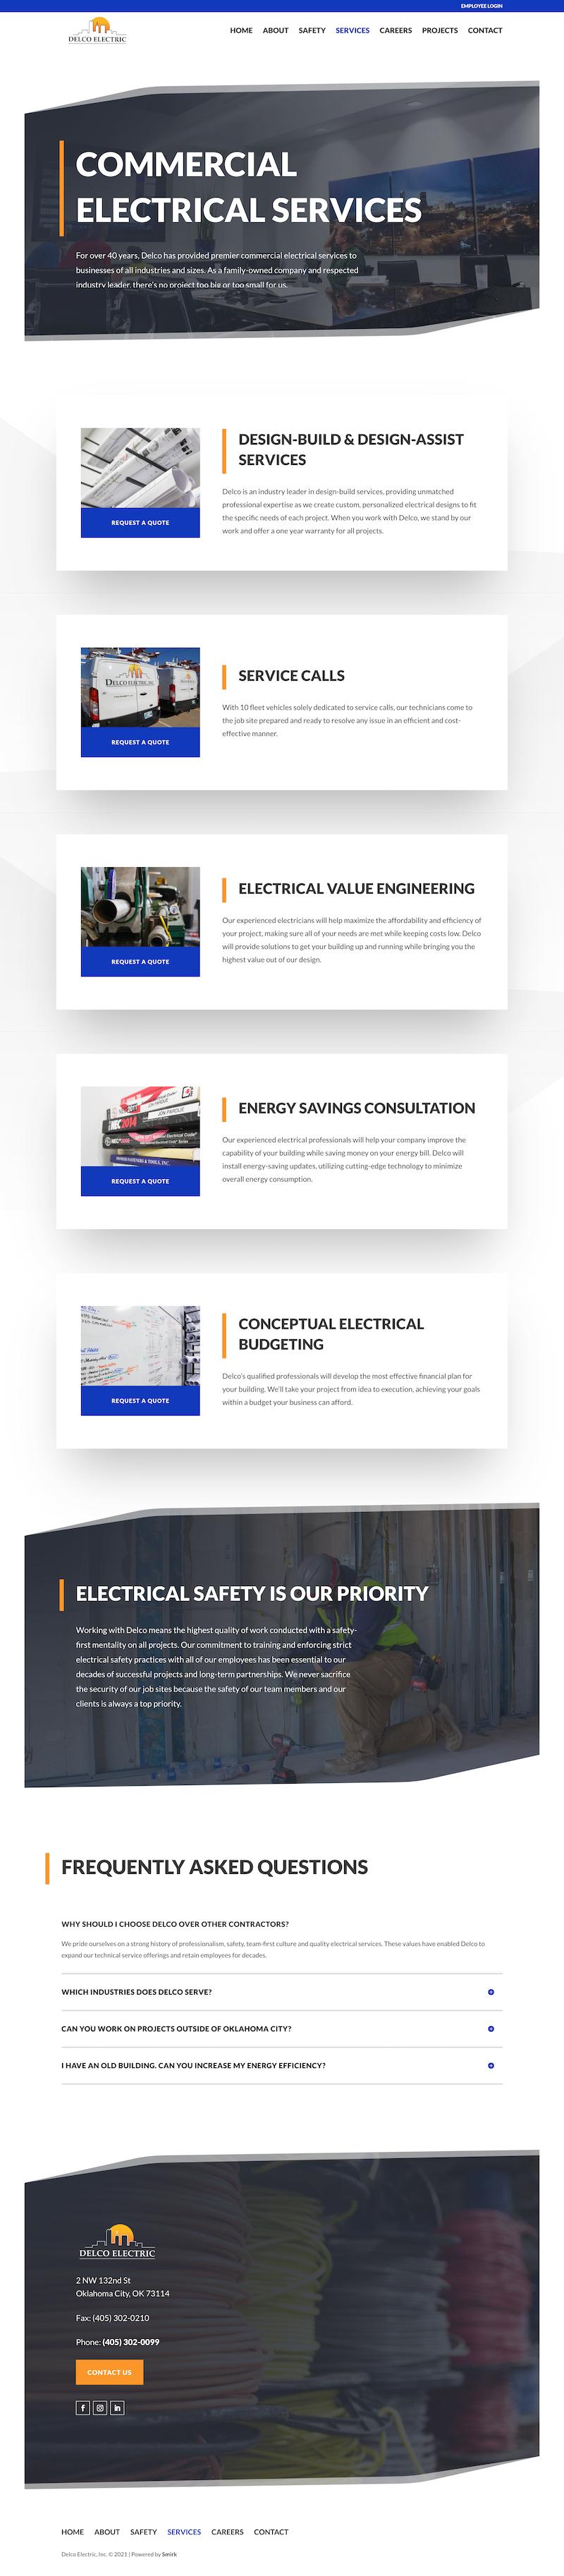 Delco Electric Services Page